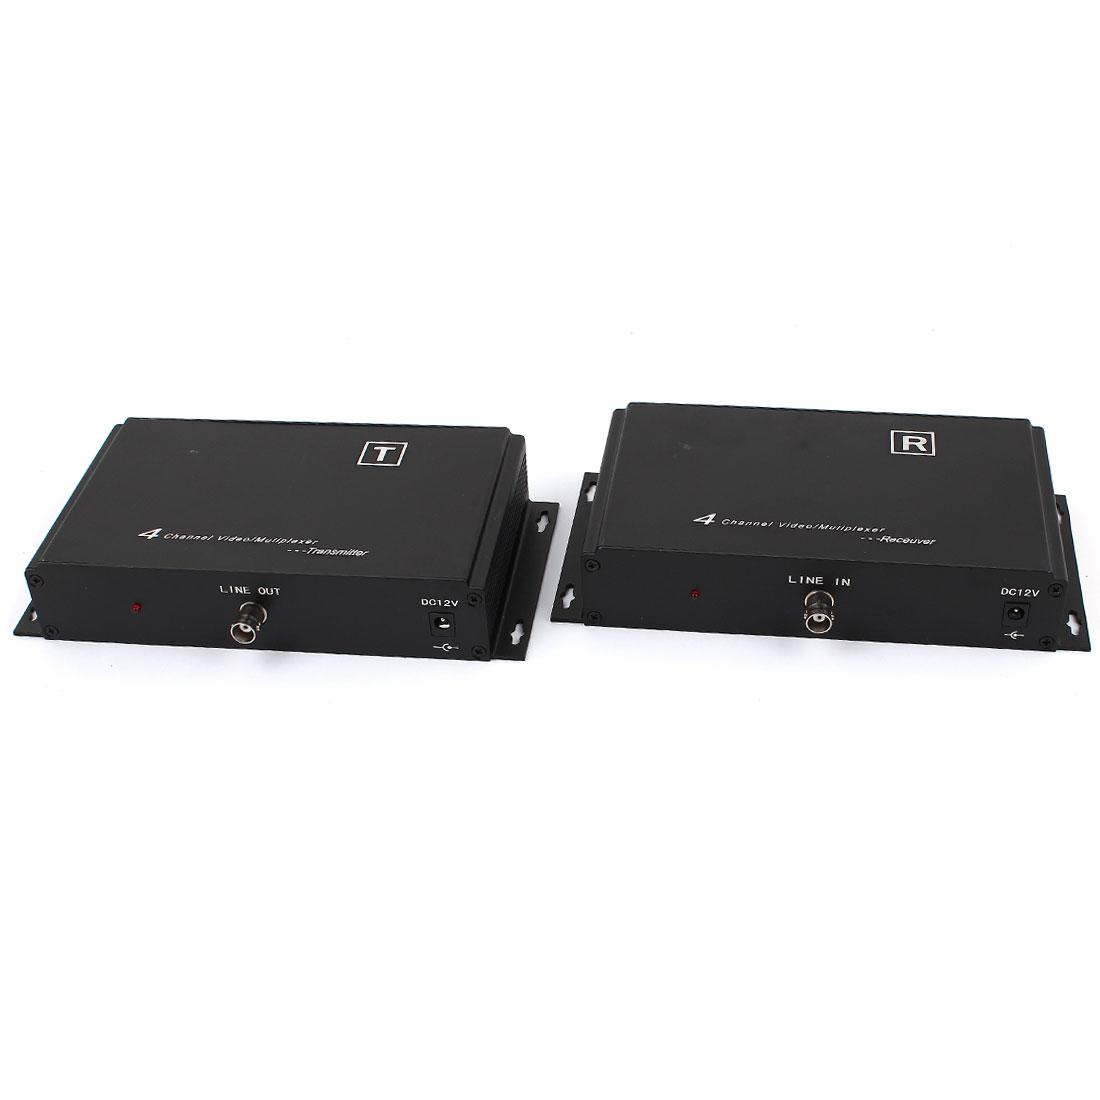 CCTV Security Camera 4 Channel 4CH Video Transmission Splitter Multiplexer Black